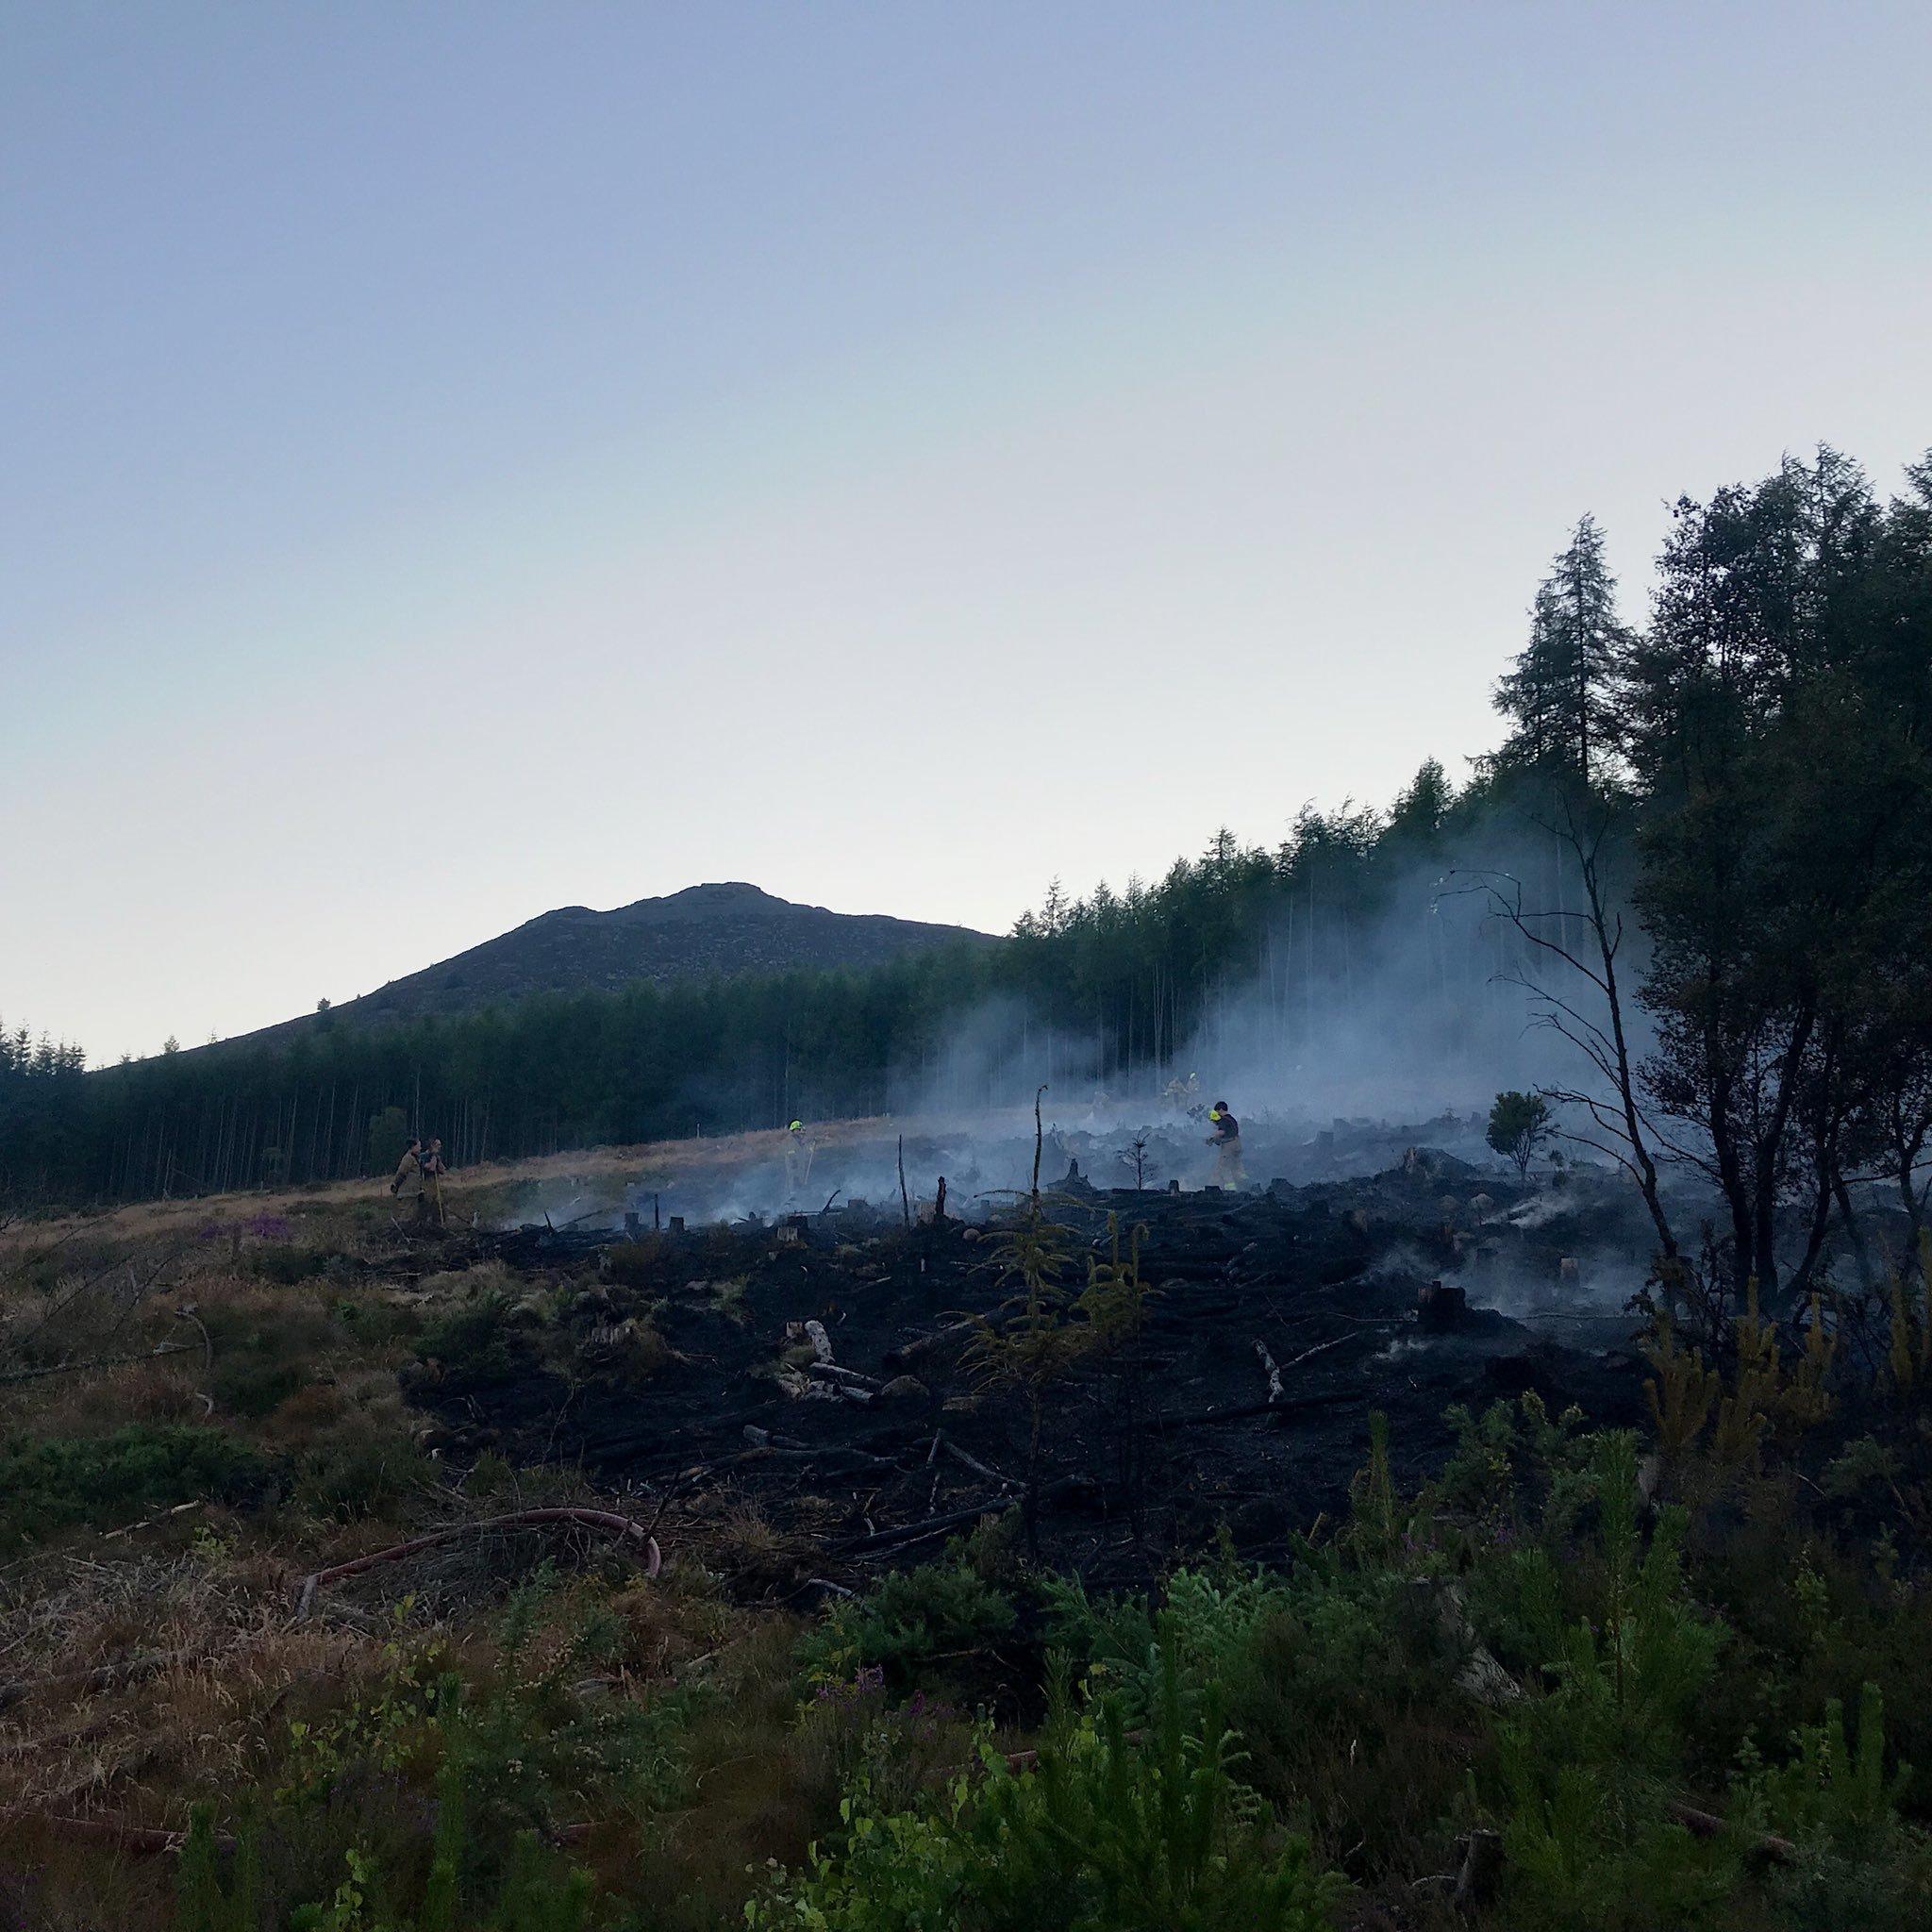 Scottish Fire and Rescue Service battled the wildfire at Bennachie. Picture via David Meldrum @d_meldrum on Twitter.